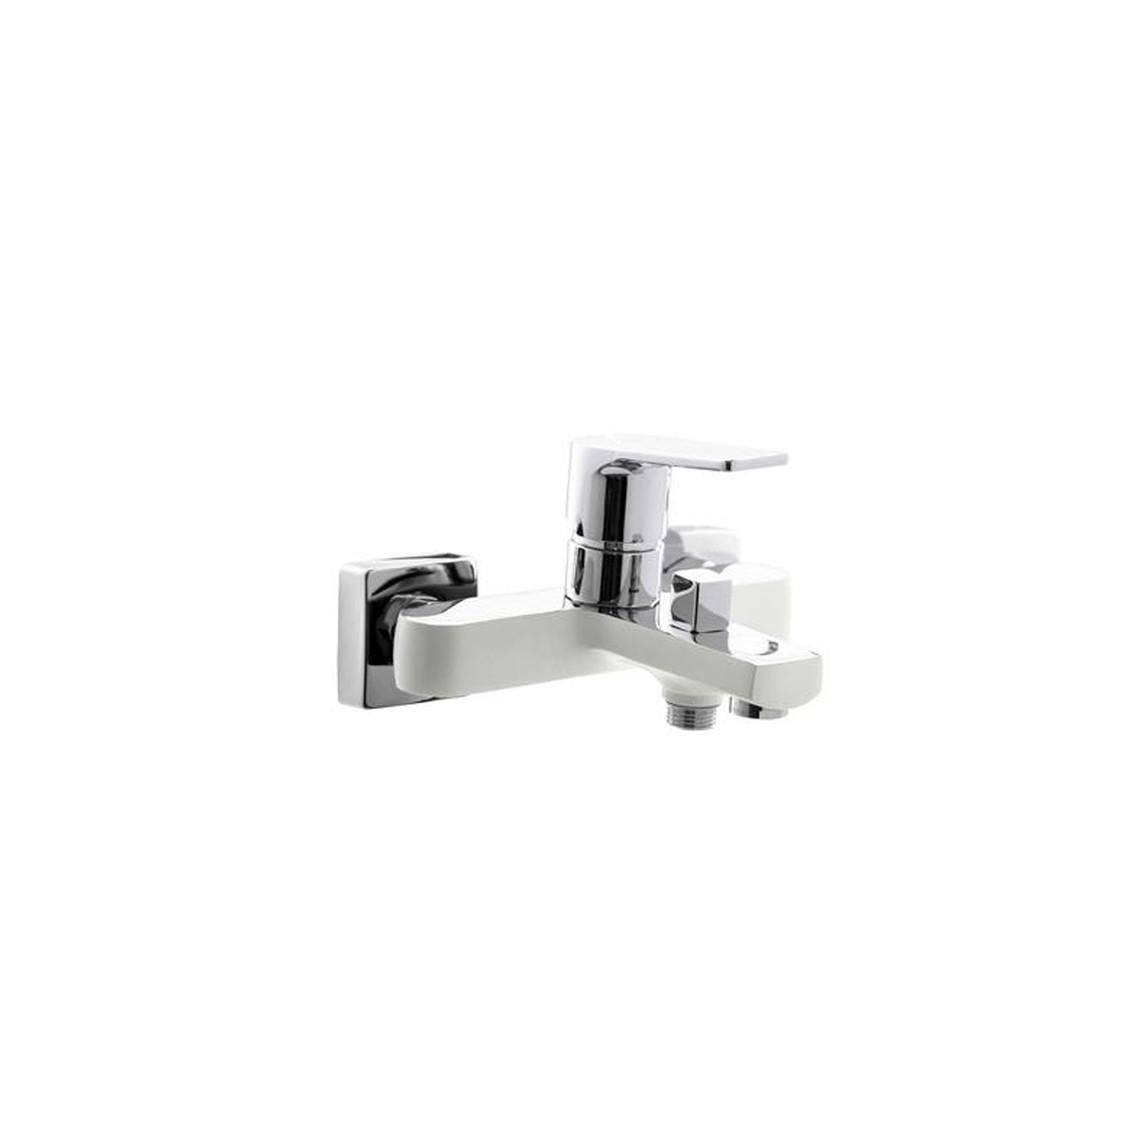 Azure Beyaz Krom Banyo Bataryası